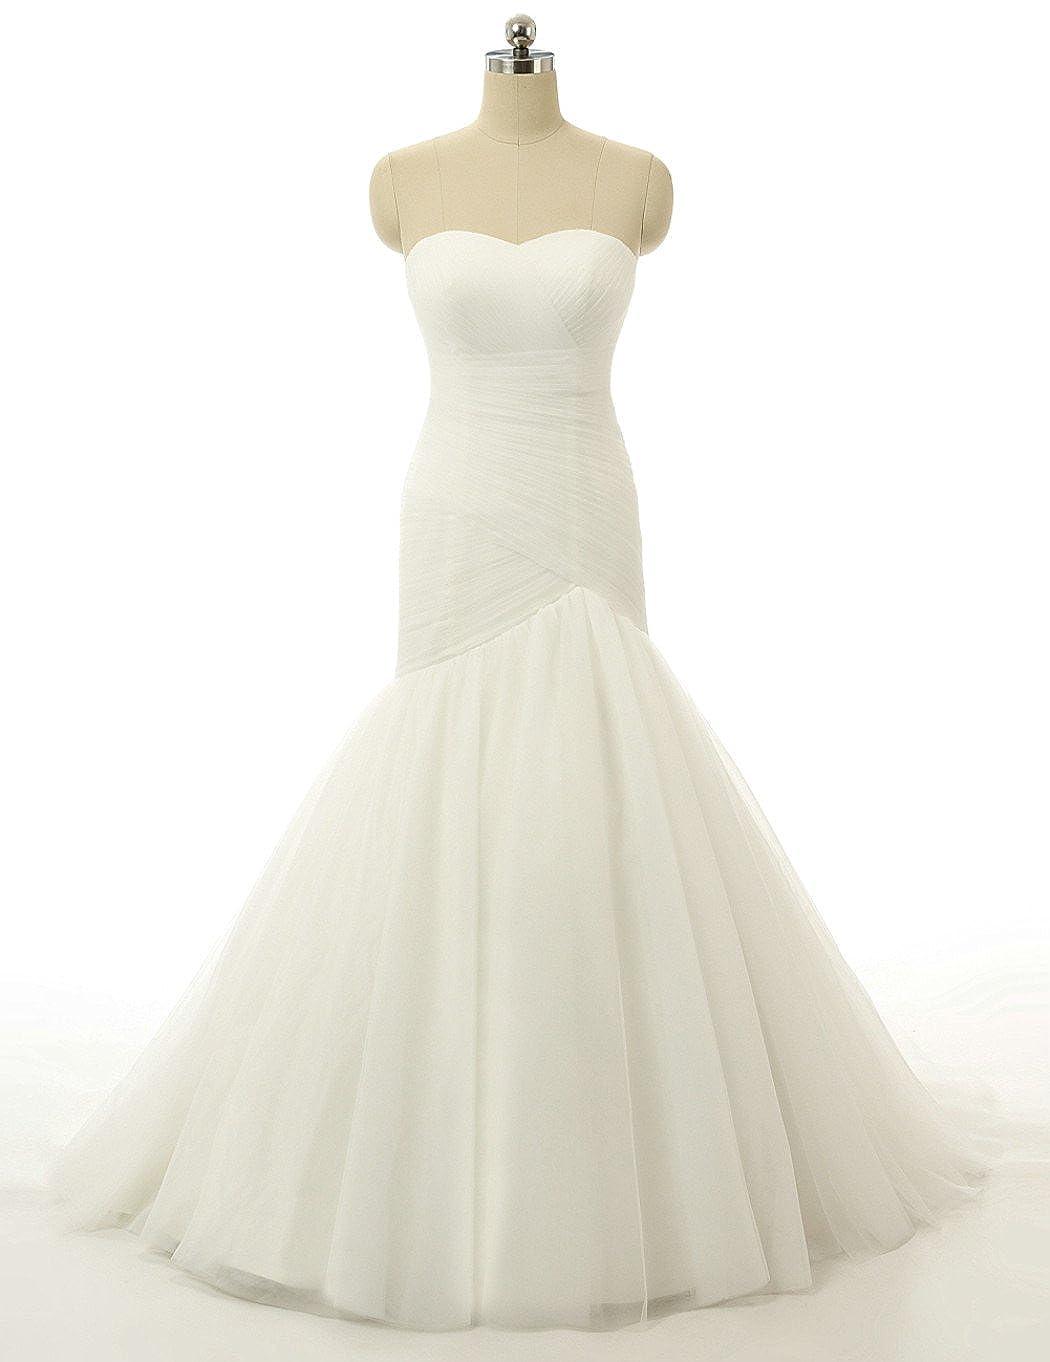 RohmBridal Womens Chapel Train Trumpet Wedding Dress Bridal Gown